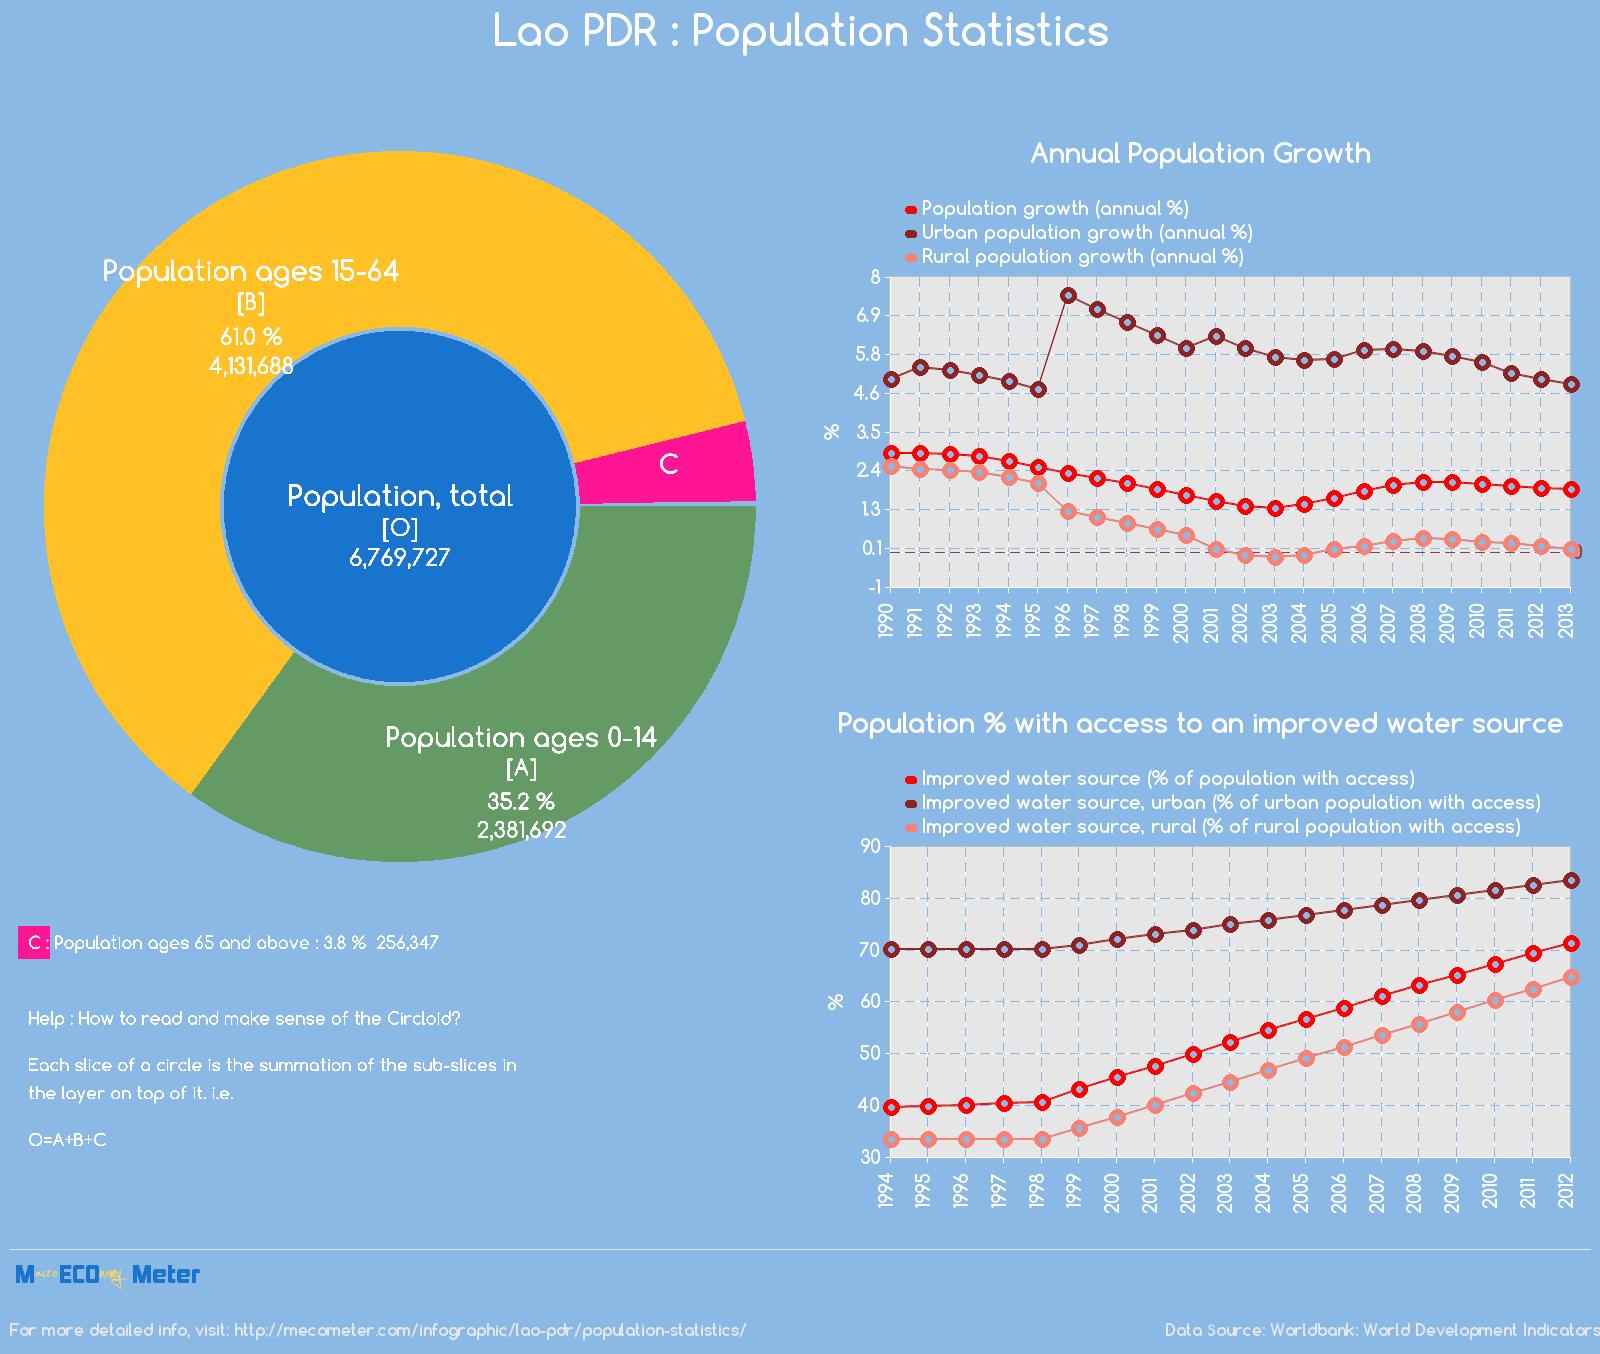 Lao PDR : Population Statistics